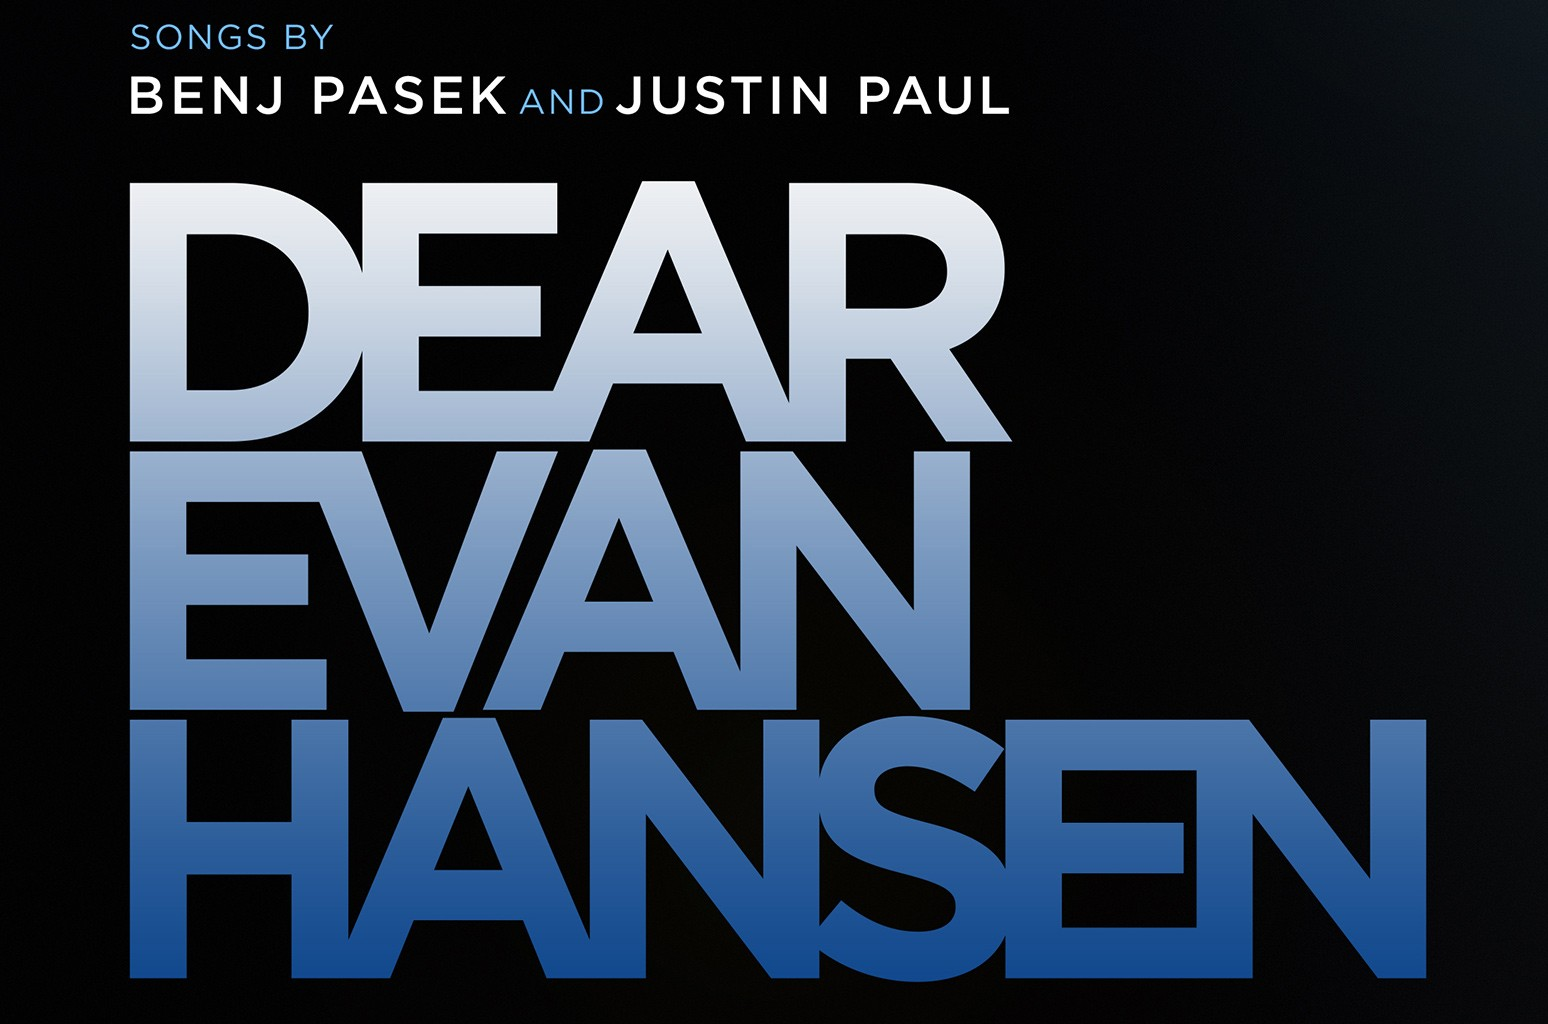 'Dear Evan Hansen' soundtrack